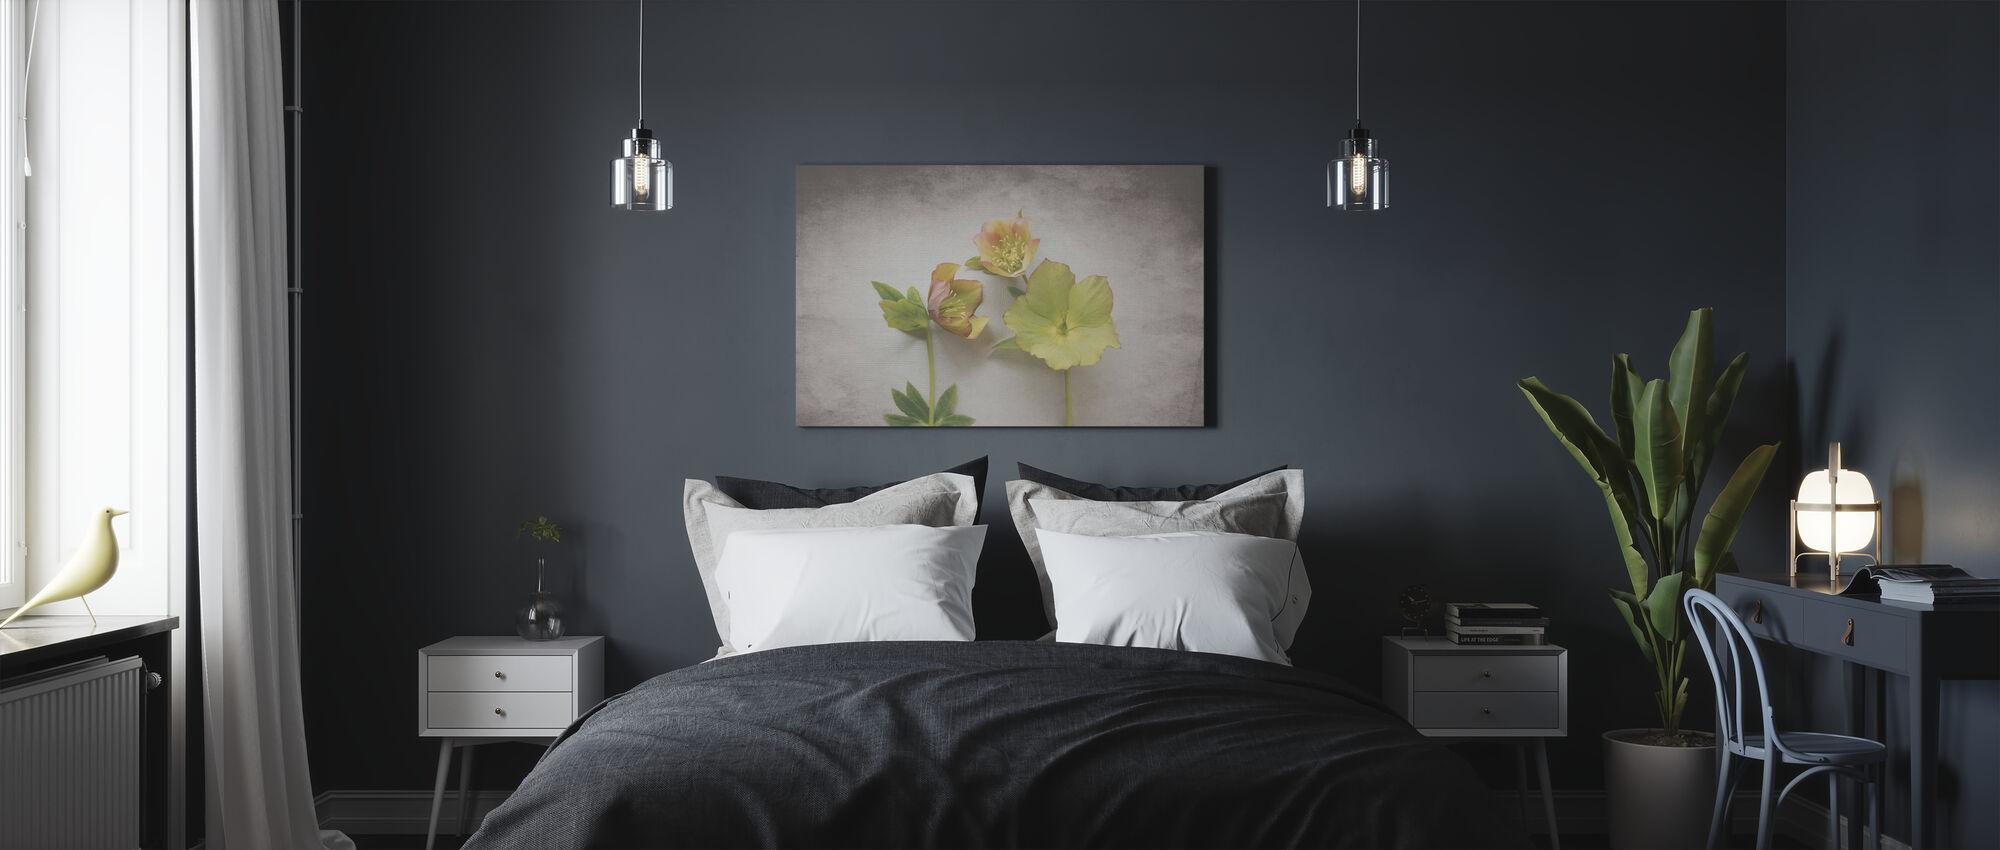 Vintage Hellebore Study IV - Canvas print - Bedroom